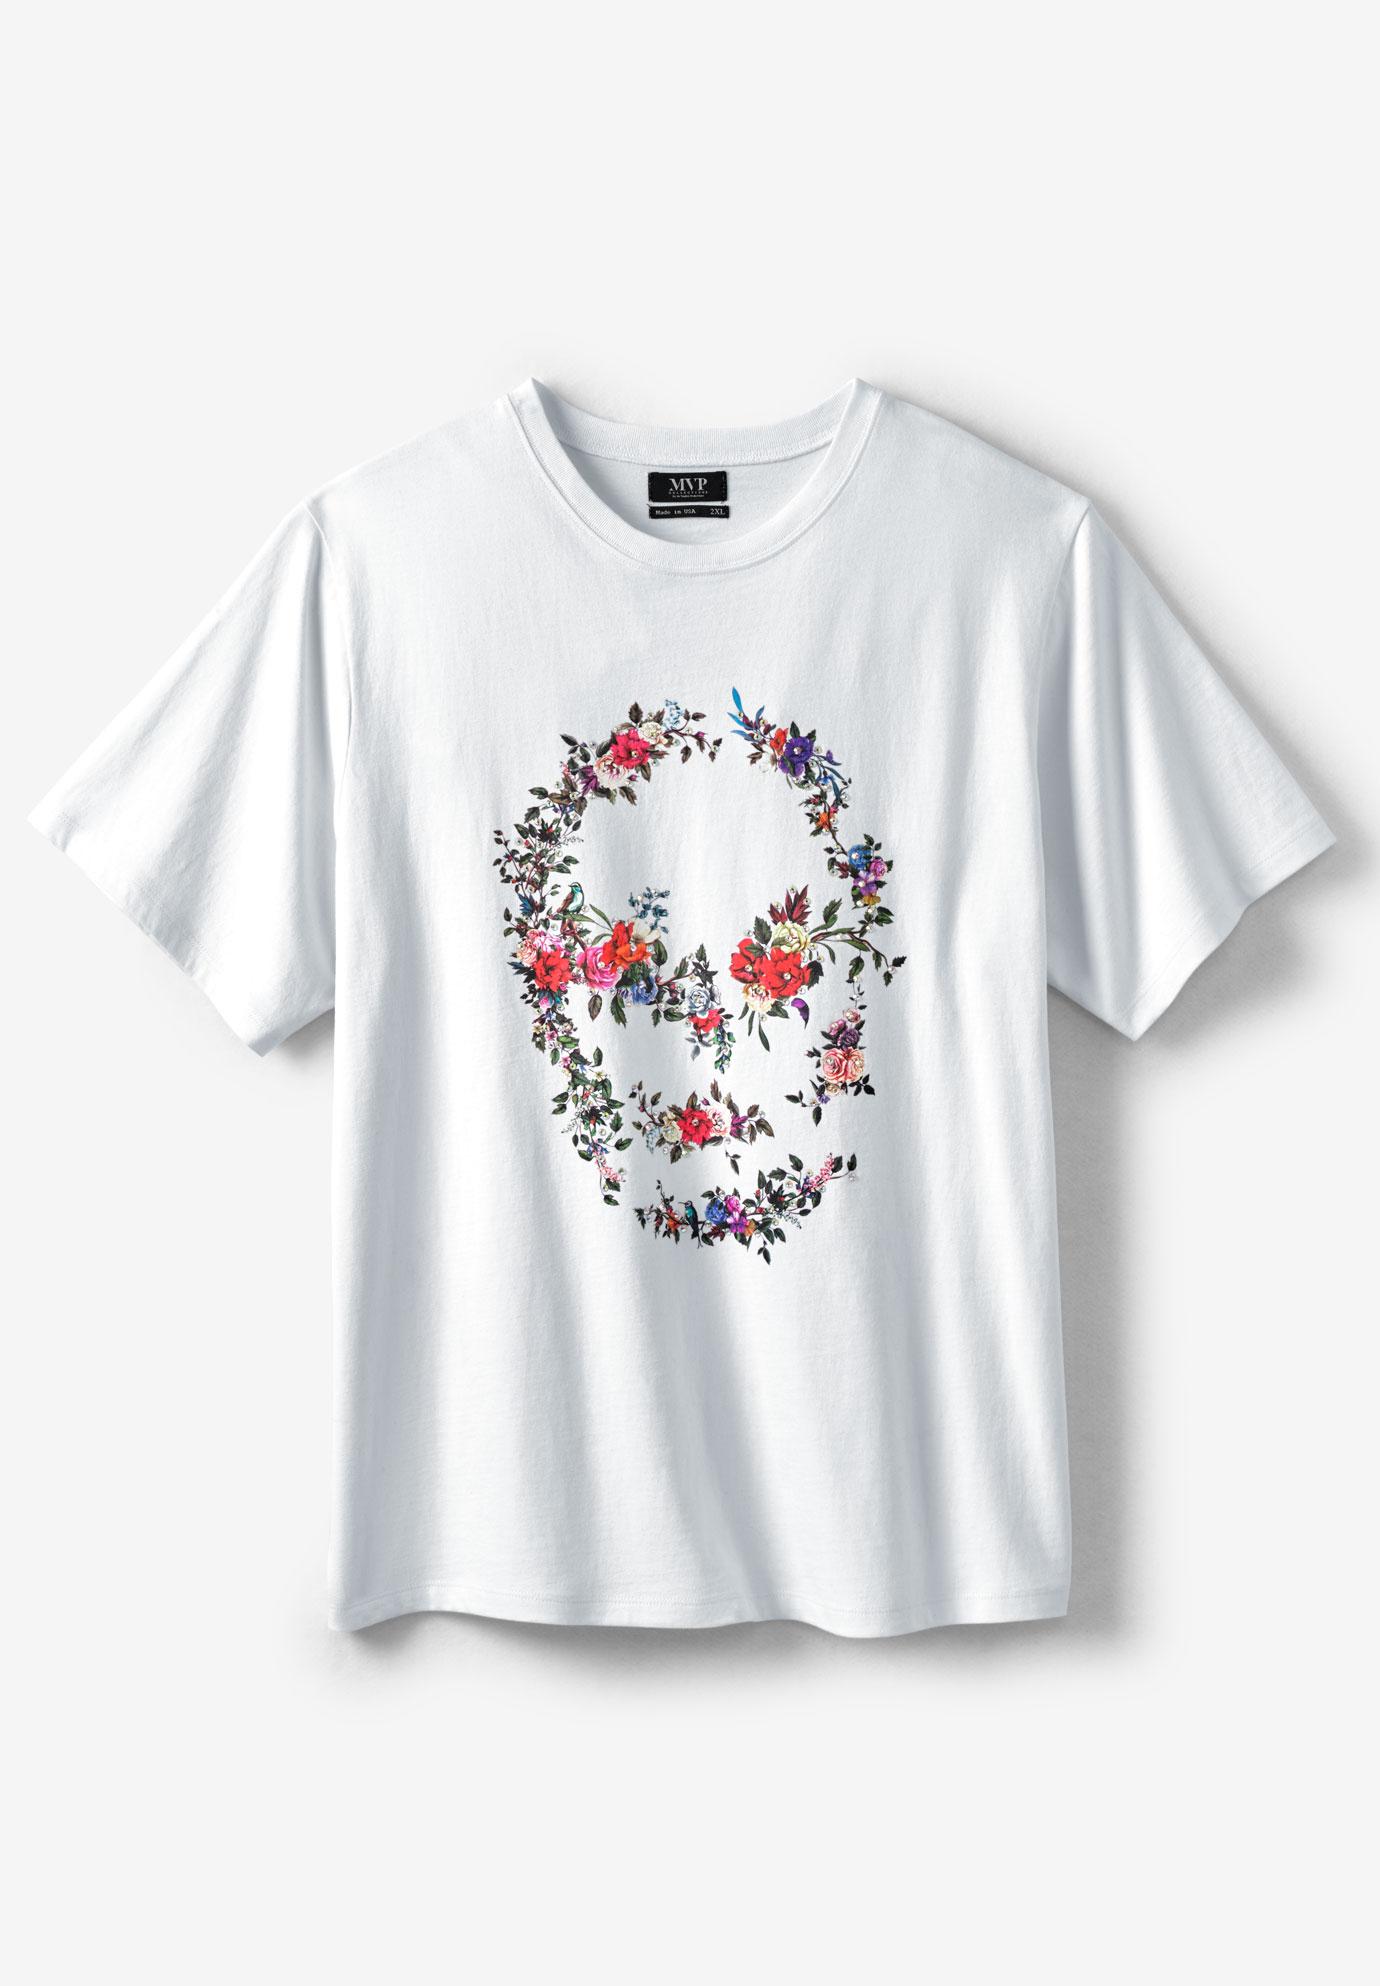 32af7c90377 MVP Collections® Floral Rhinestone Embellished Skull-Print Tee| Big ...